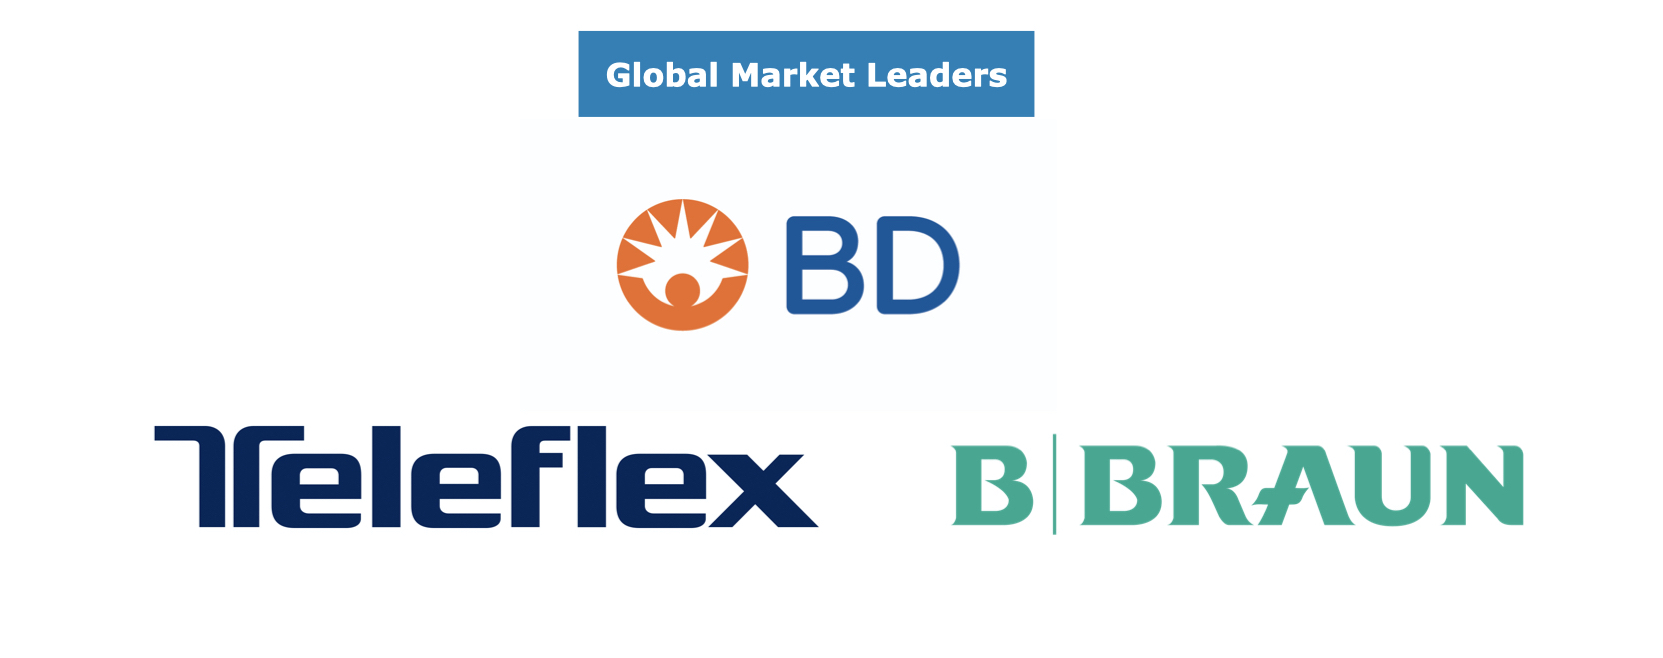 Global Vascular Access Market Leaders